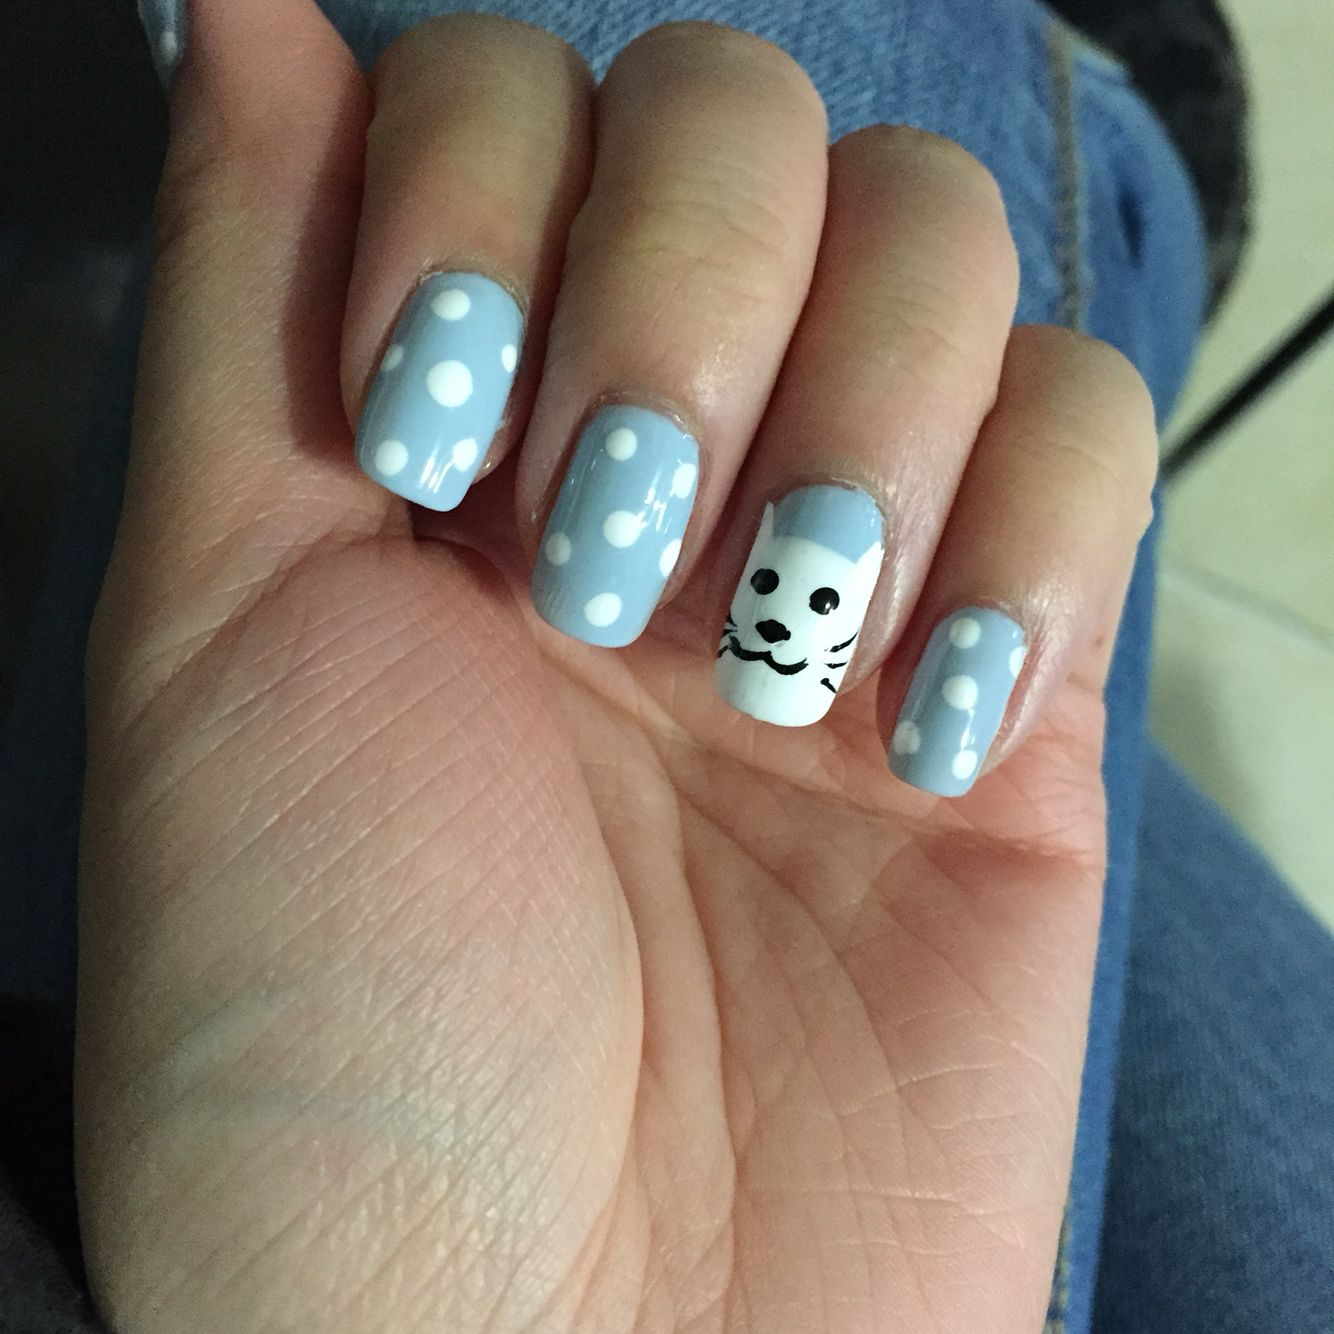 Kitten nails | Nail art designs I\'ve tried | Pinterest